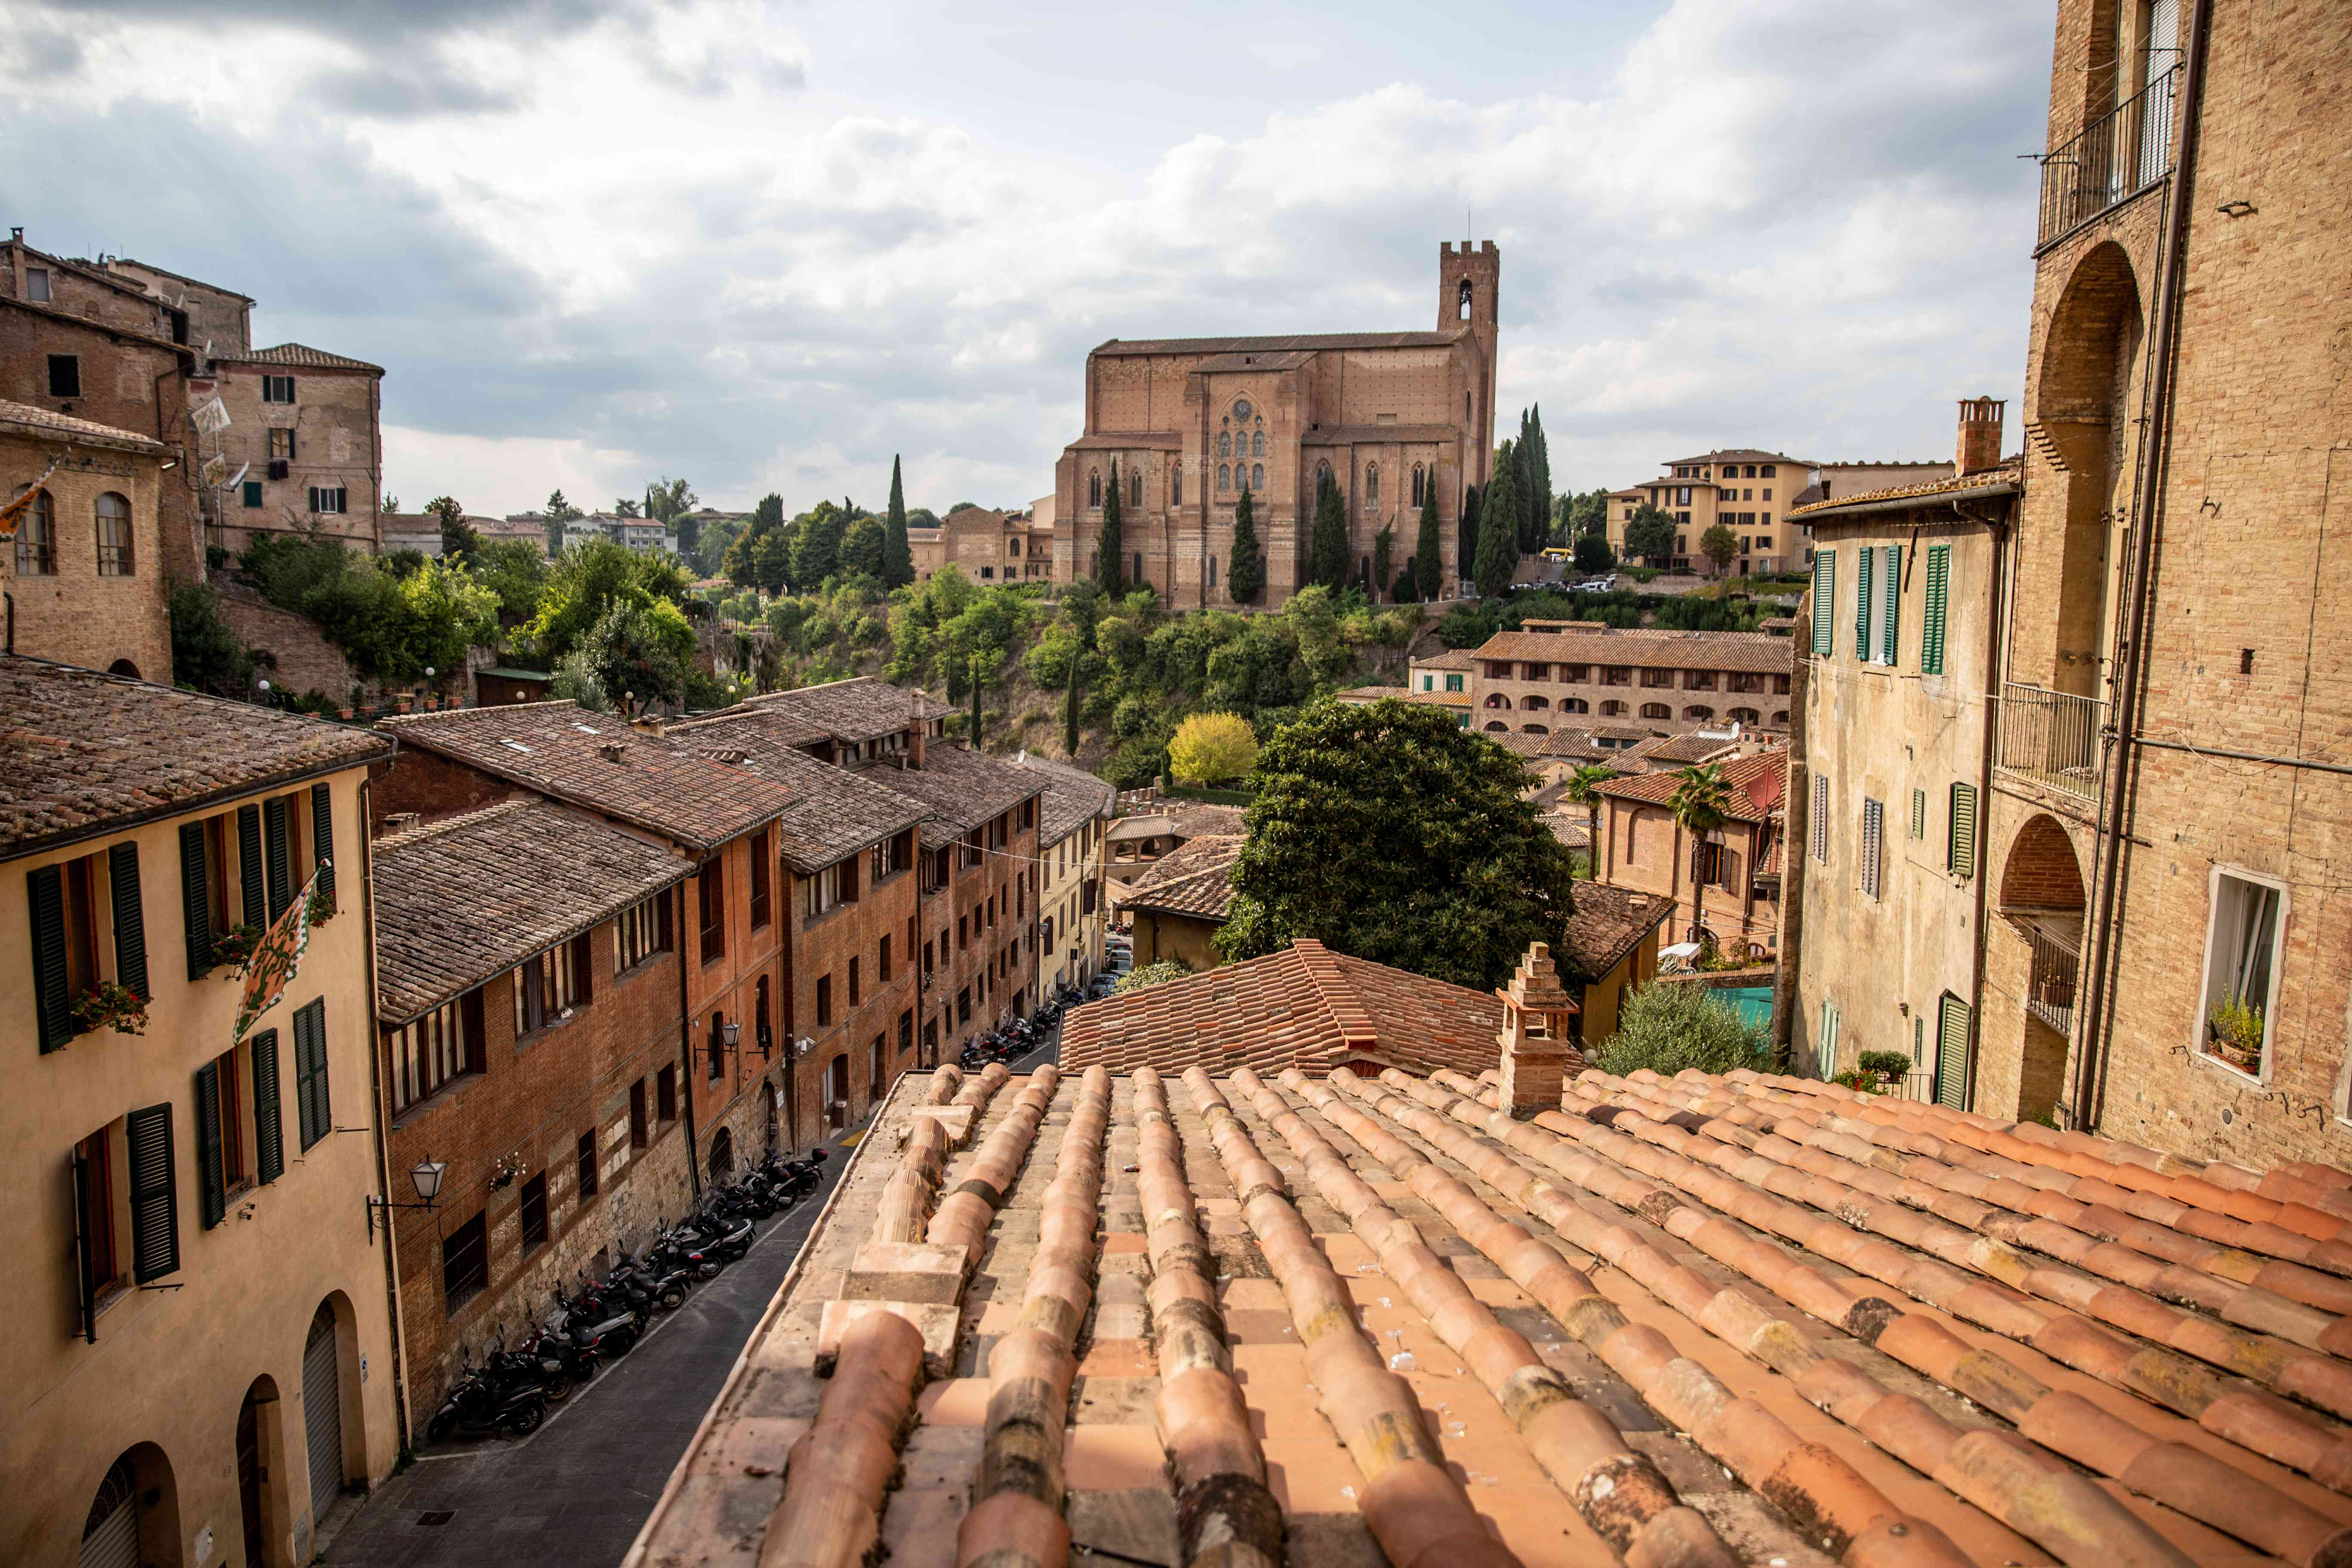 View of rooftops in Siena